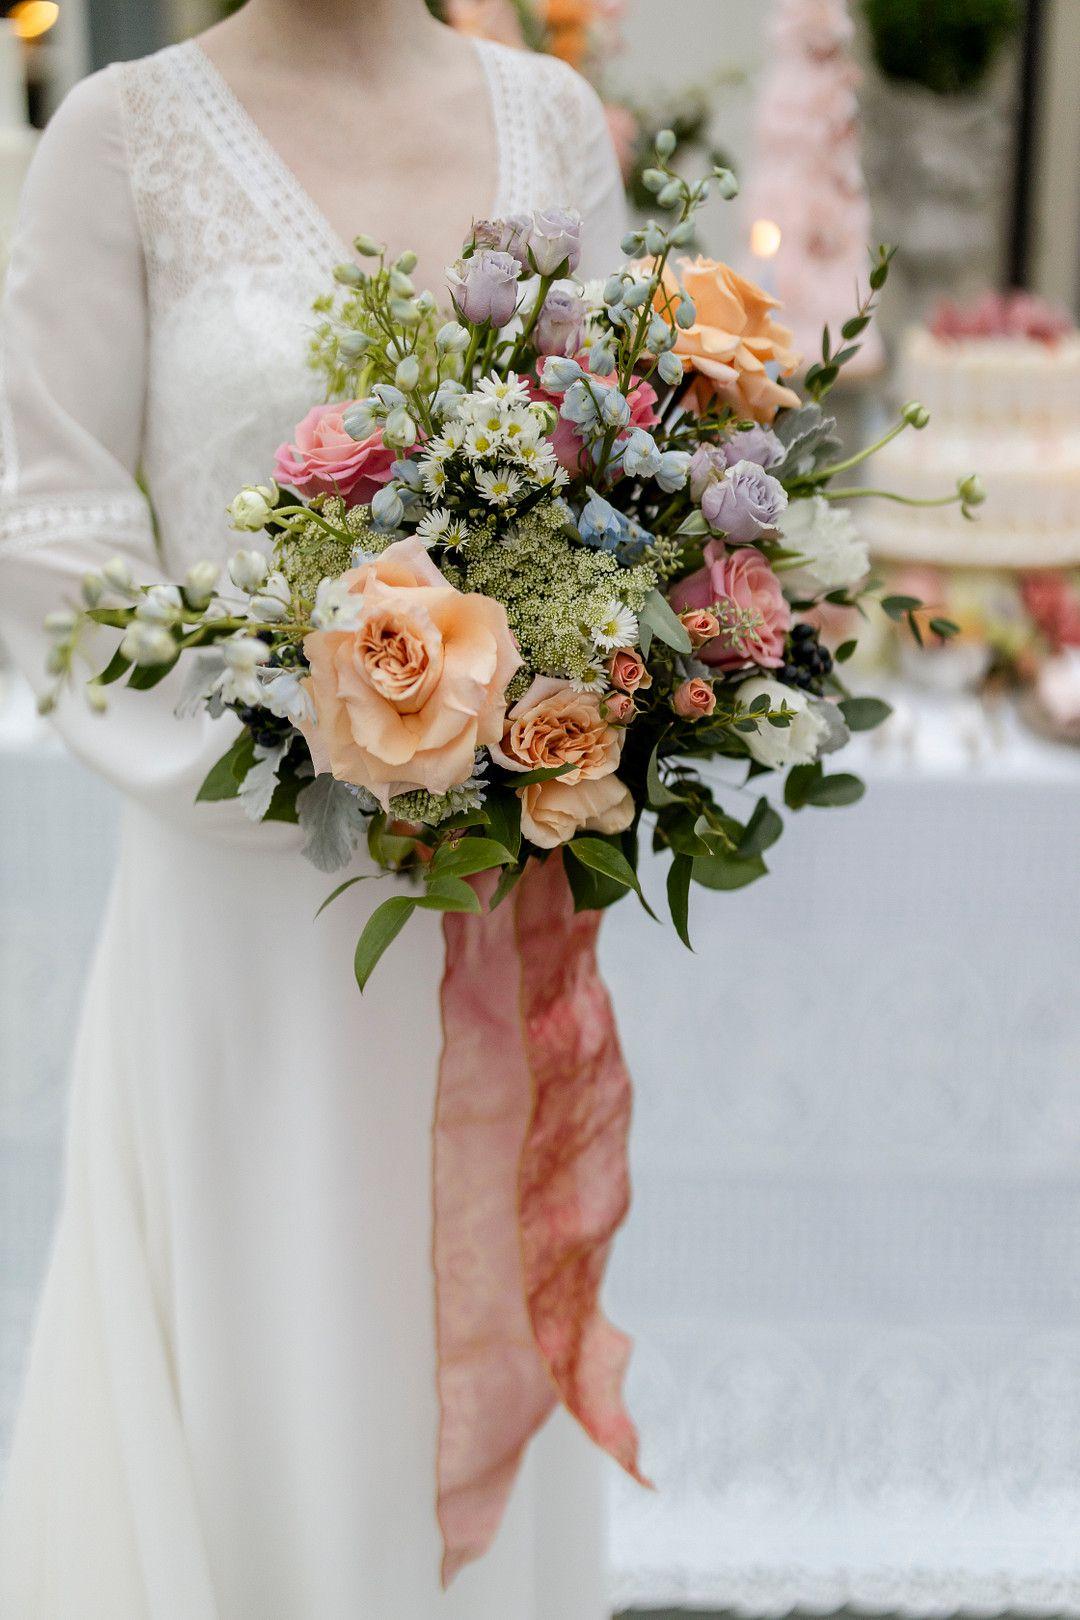 bridgerton netflix inspired bridal bouquet